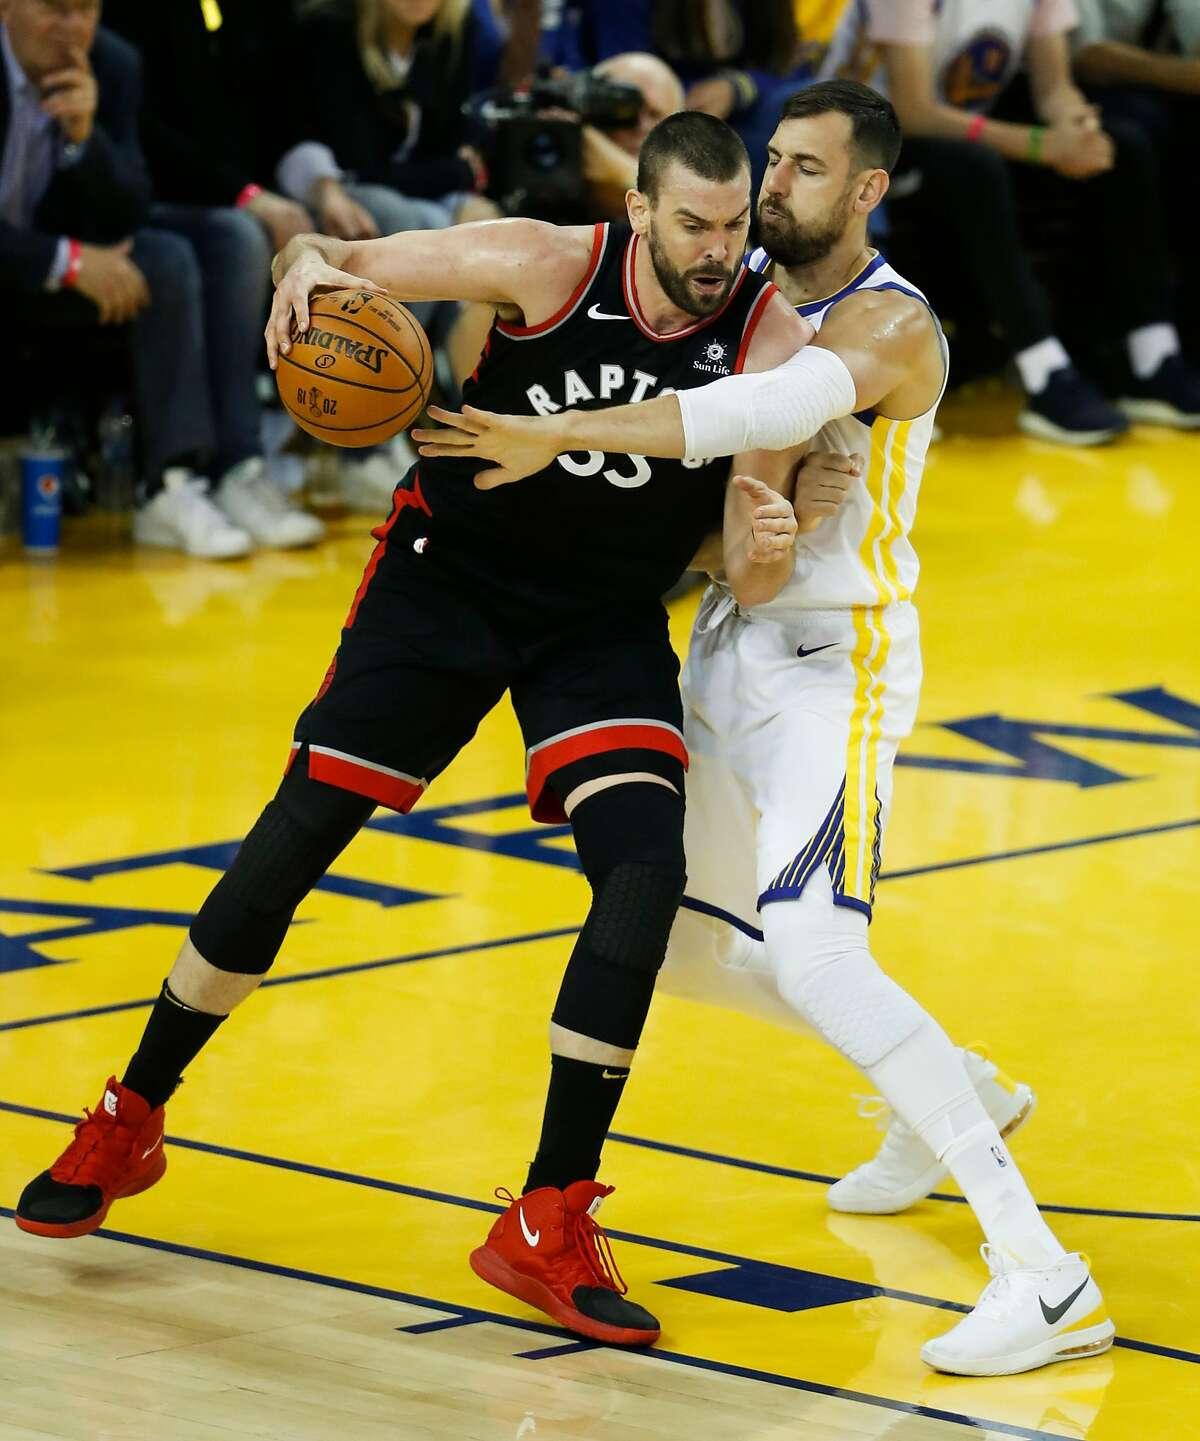 Golden State Warriors' Andrew Bogut guards Toronto Raptors' Marc Gasol in the first quarter during game 3 of the NBA Finals between the Golden State Warriors and the Toronto Raptors at Oracle Arena on Wednesday, June 5, 2019 in Oakland, Calif.